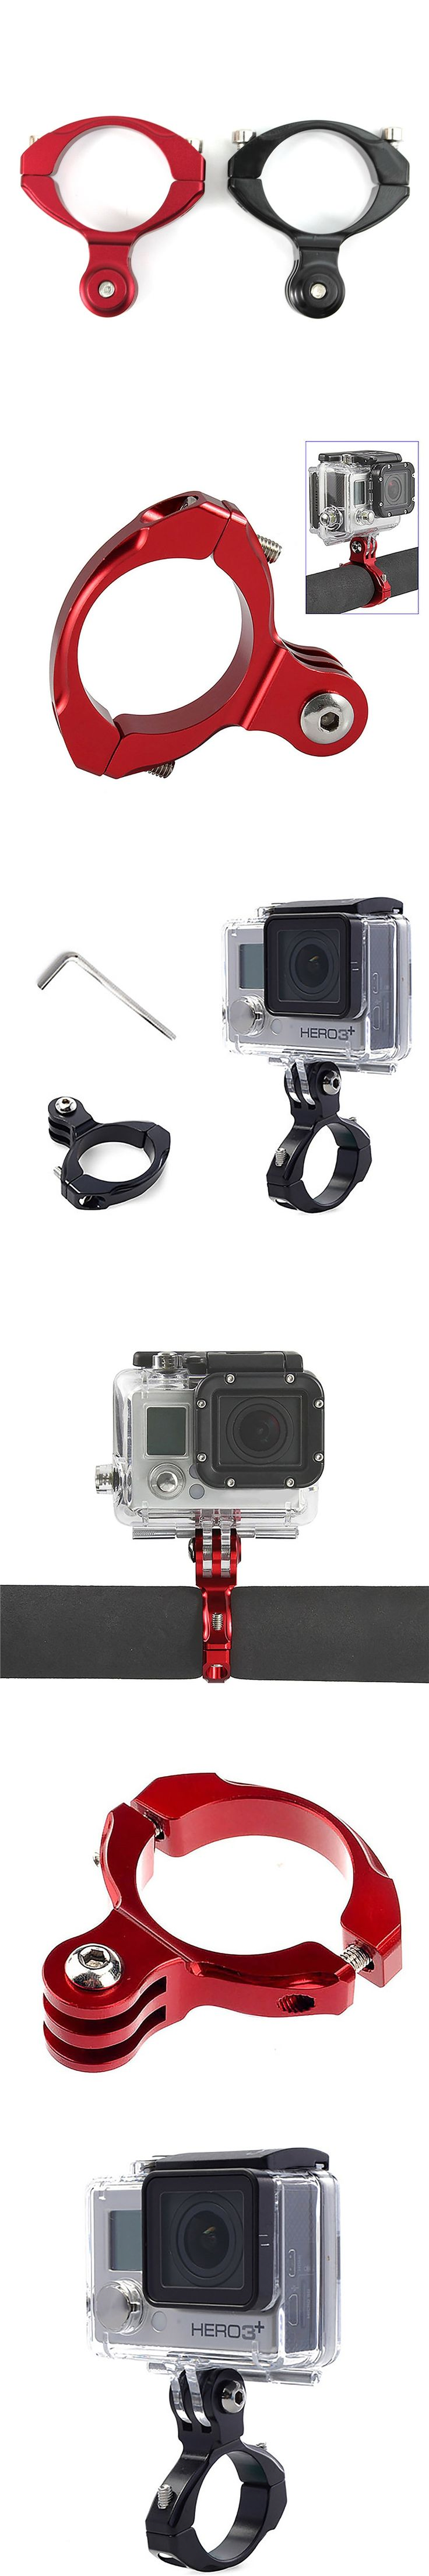 1X Vogue Bicycle Handlebar Utility Mount Holder For Gopro Hero 1/2/3/3+ Camera